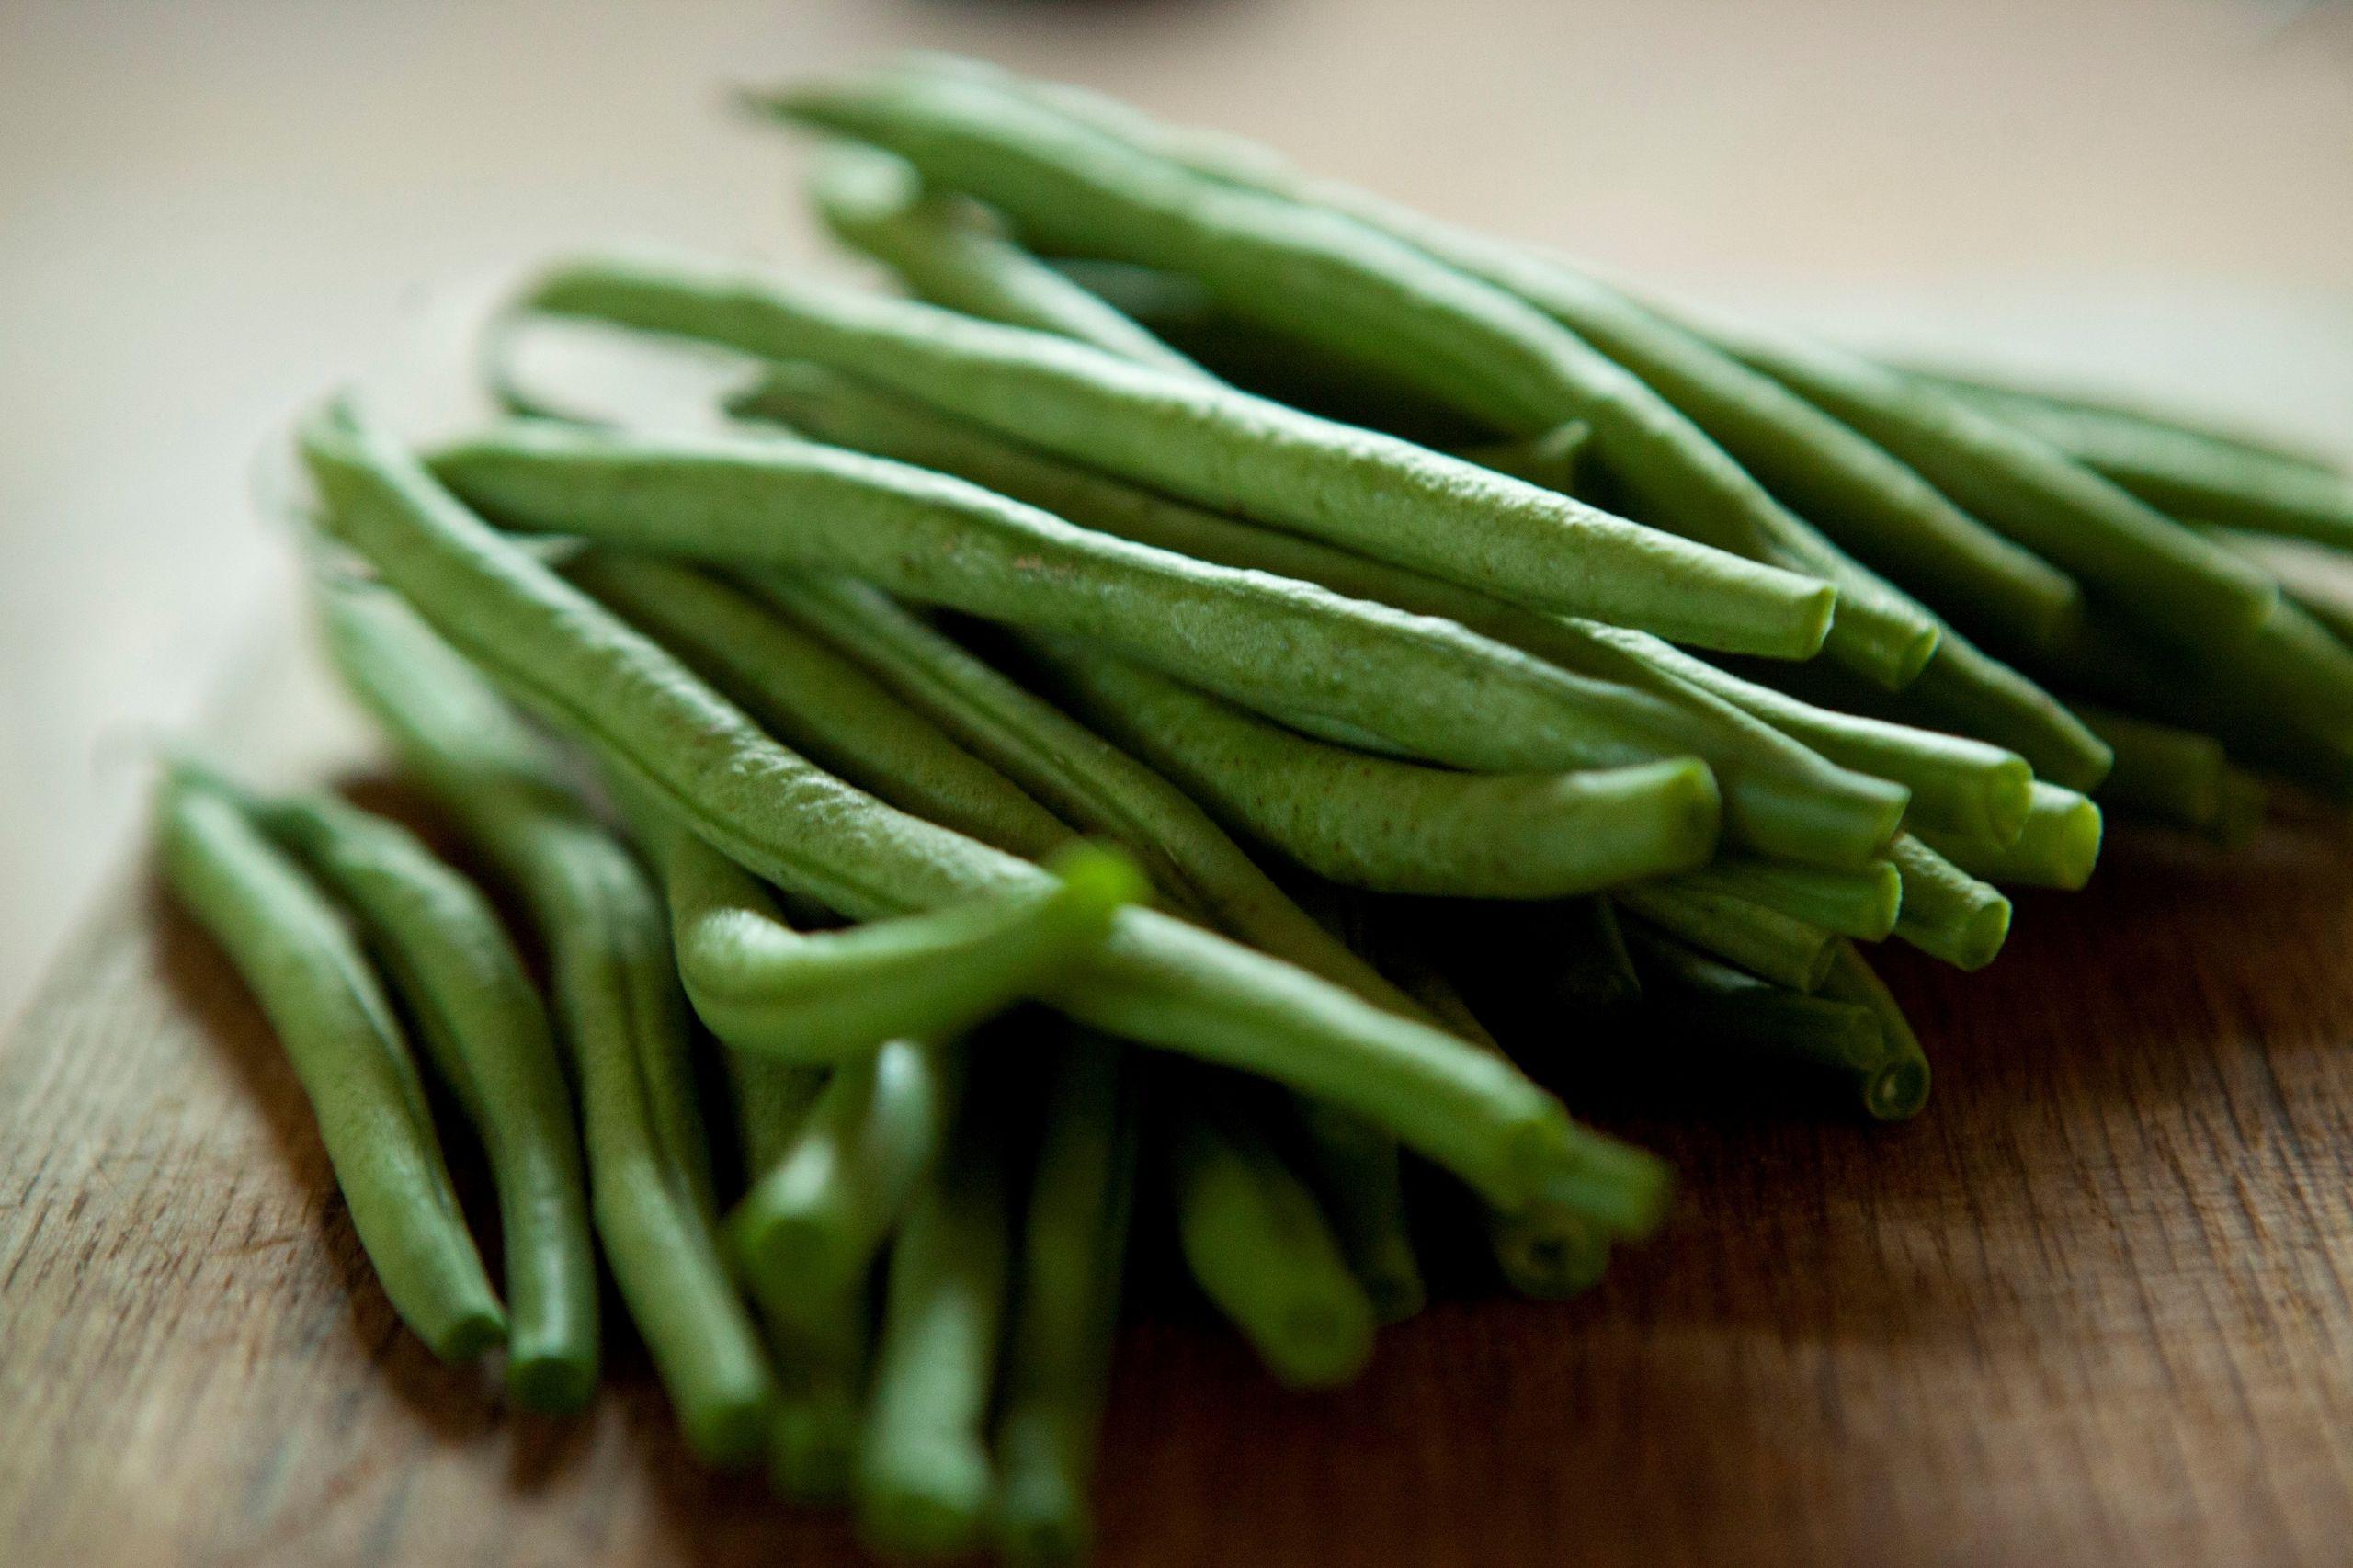 fryse grøntsager